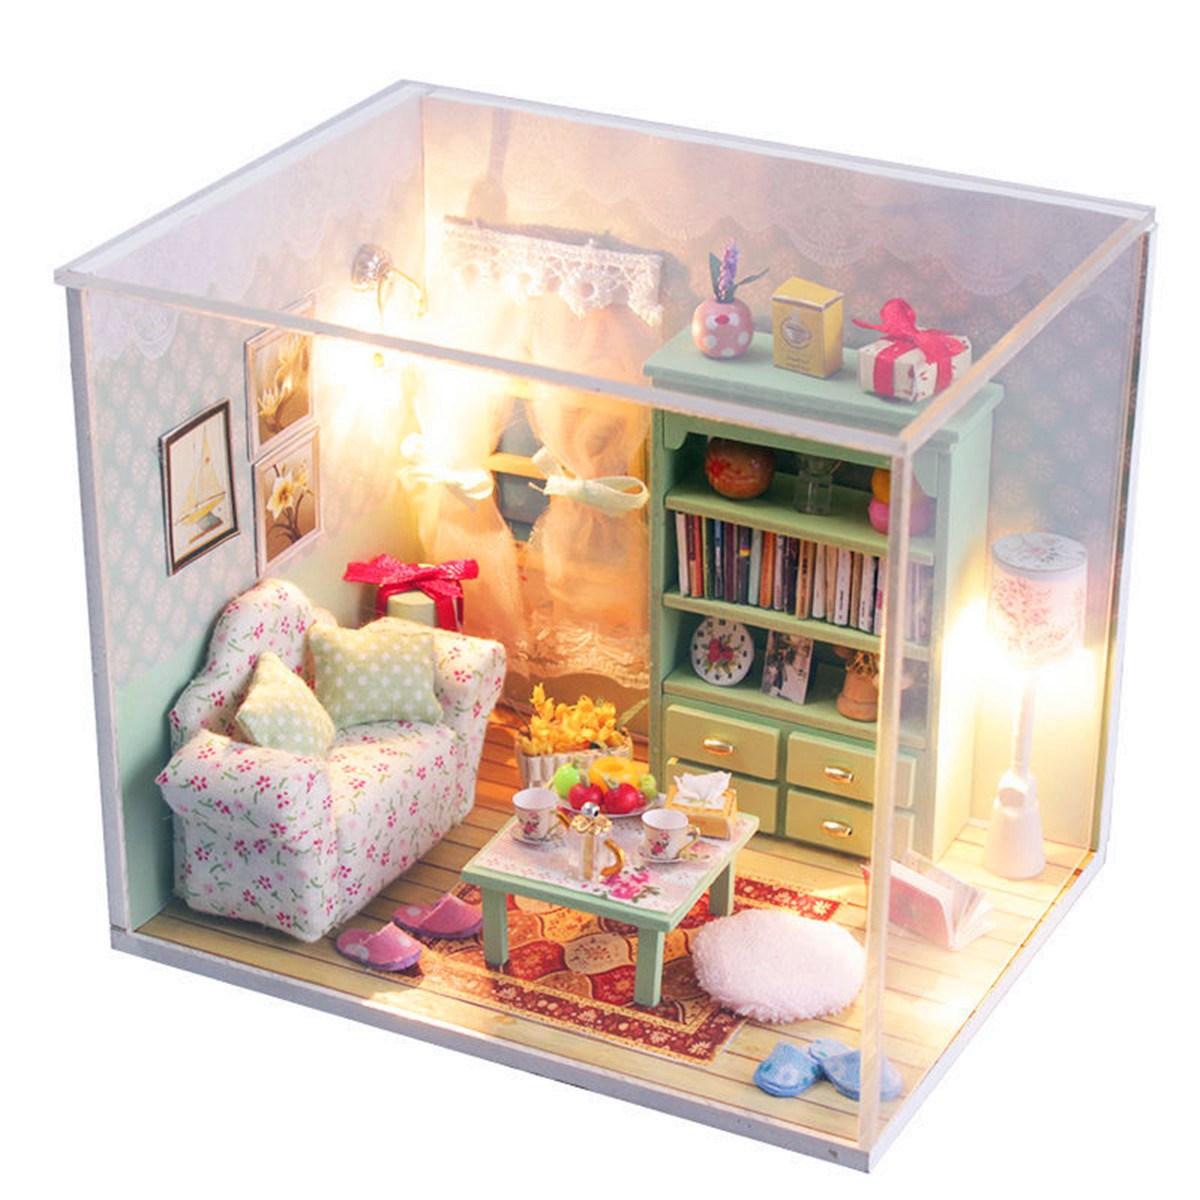 Hoomeda Diy Mini Dream House Wood Dollhouse Miniature With